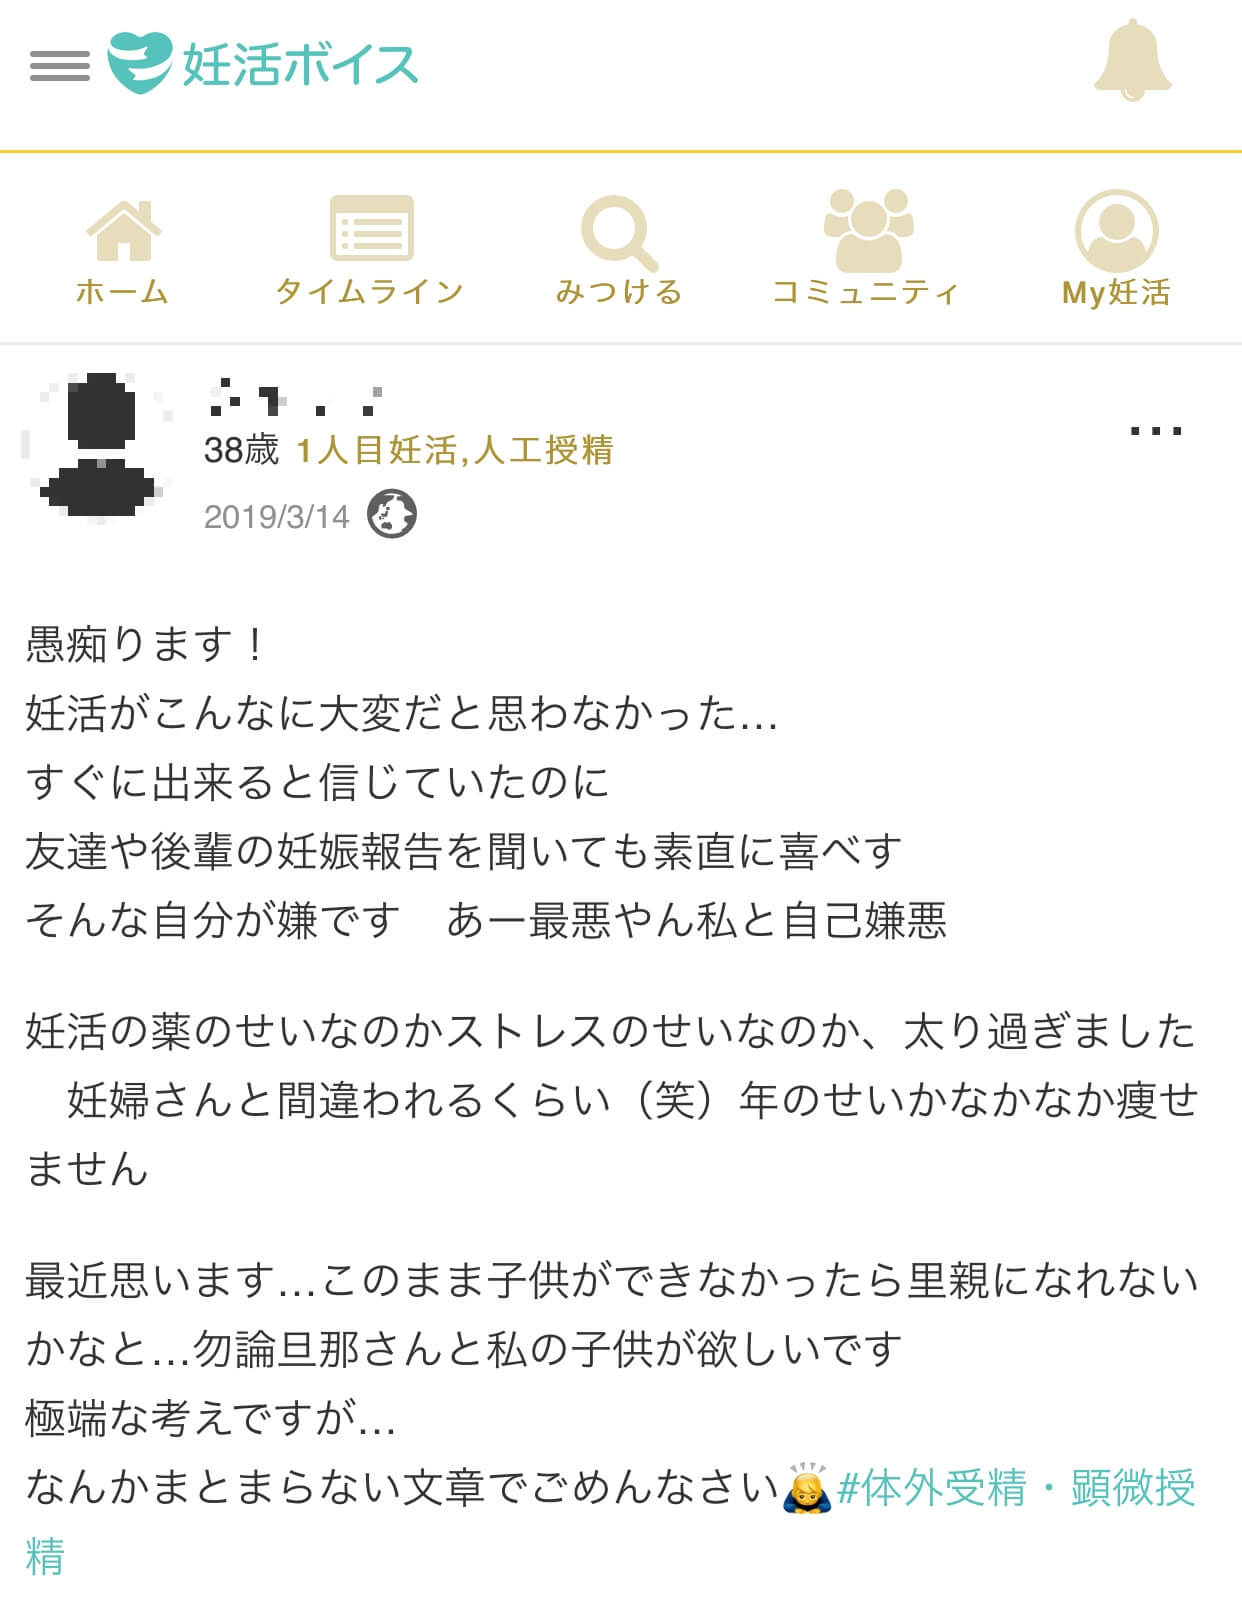 Sさん(38歳・1人目妊活・人工授精)